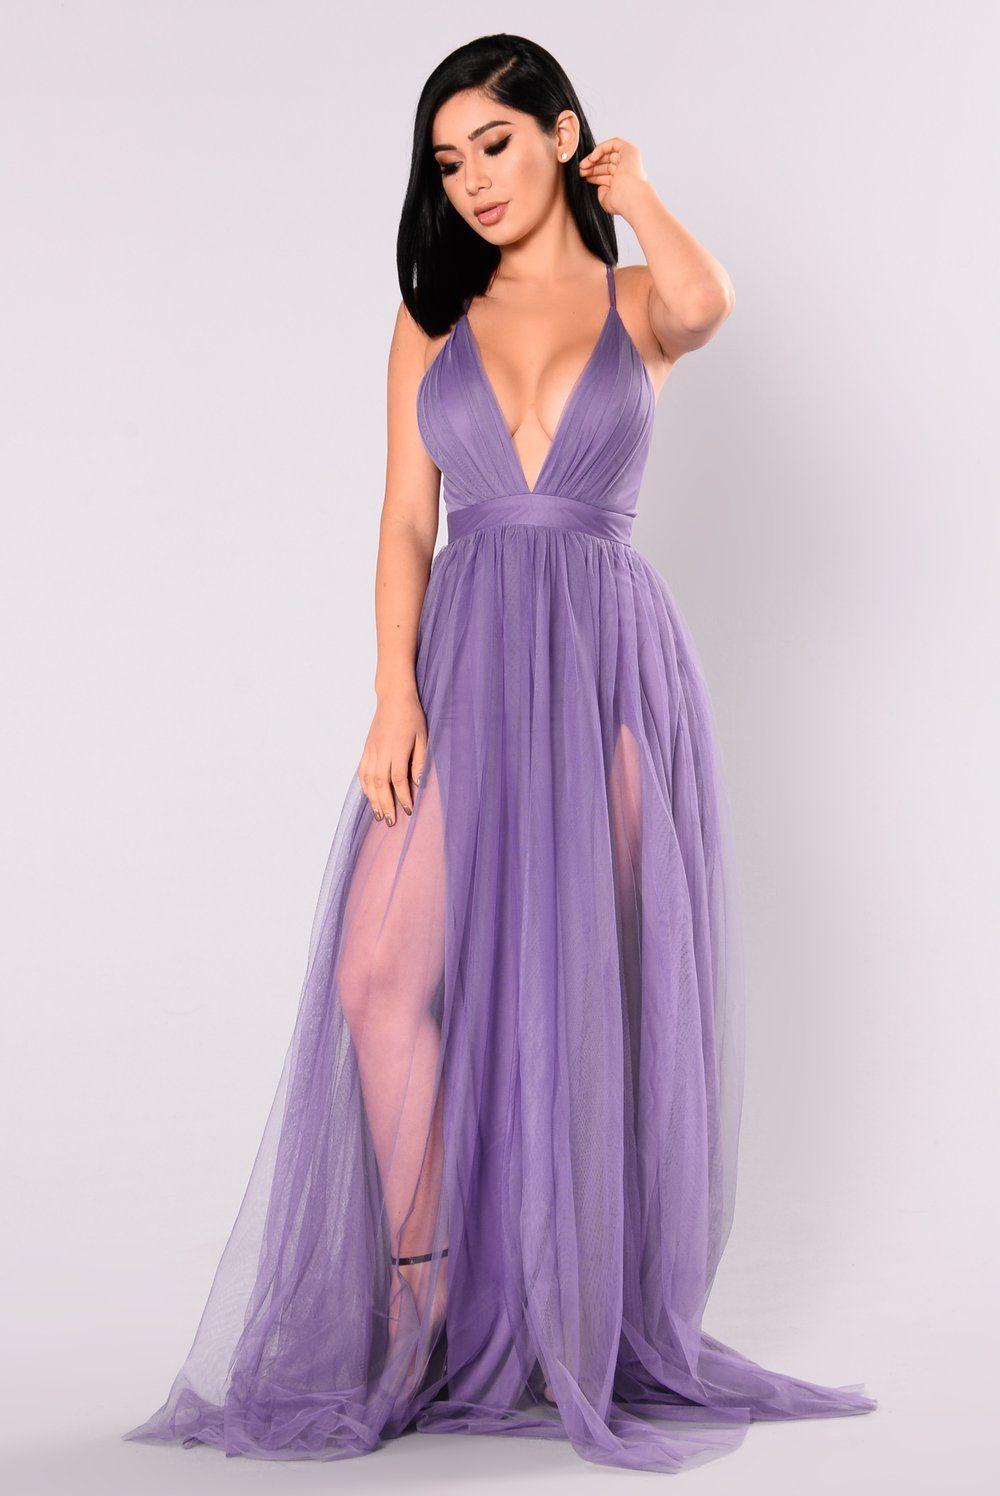 9c3eaae497 High Quality Runway Maxi Dress | Saddha